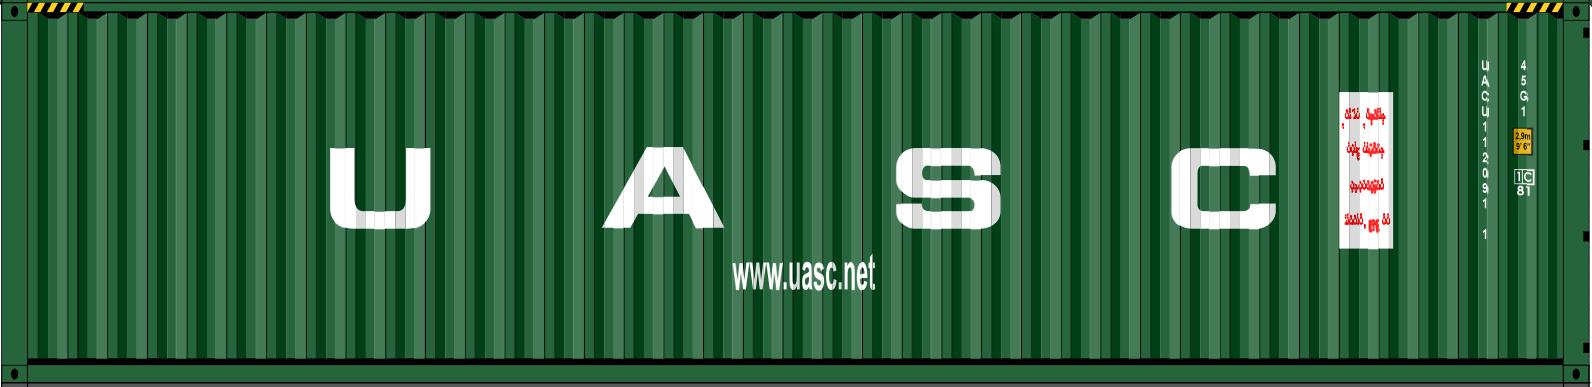 USC4011